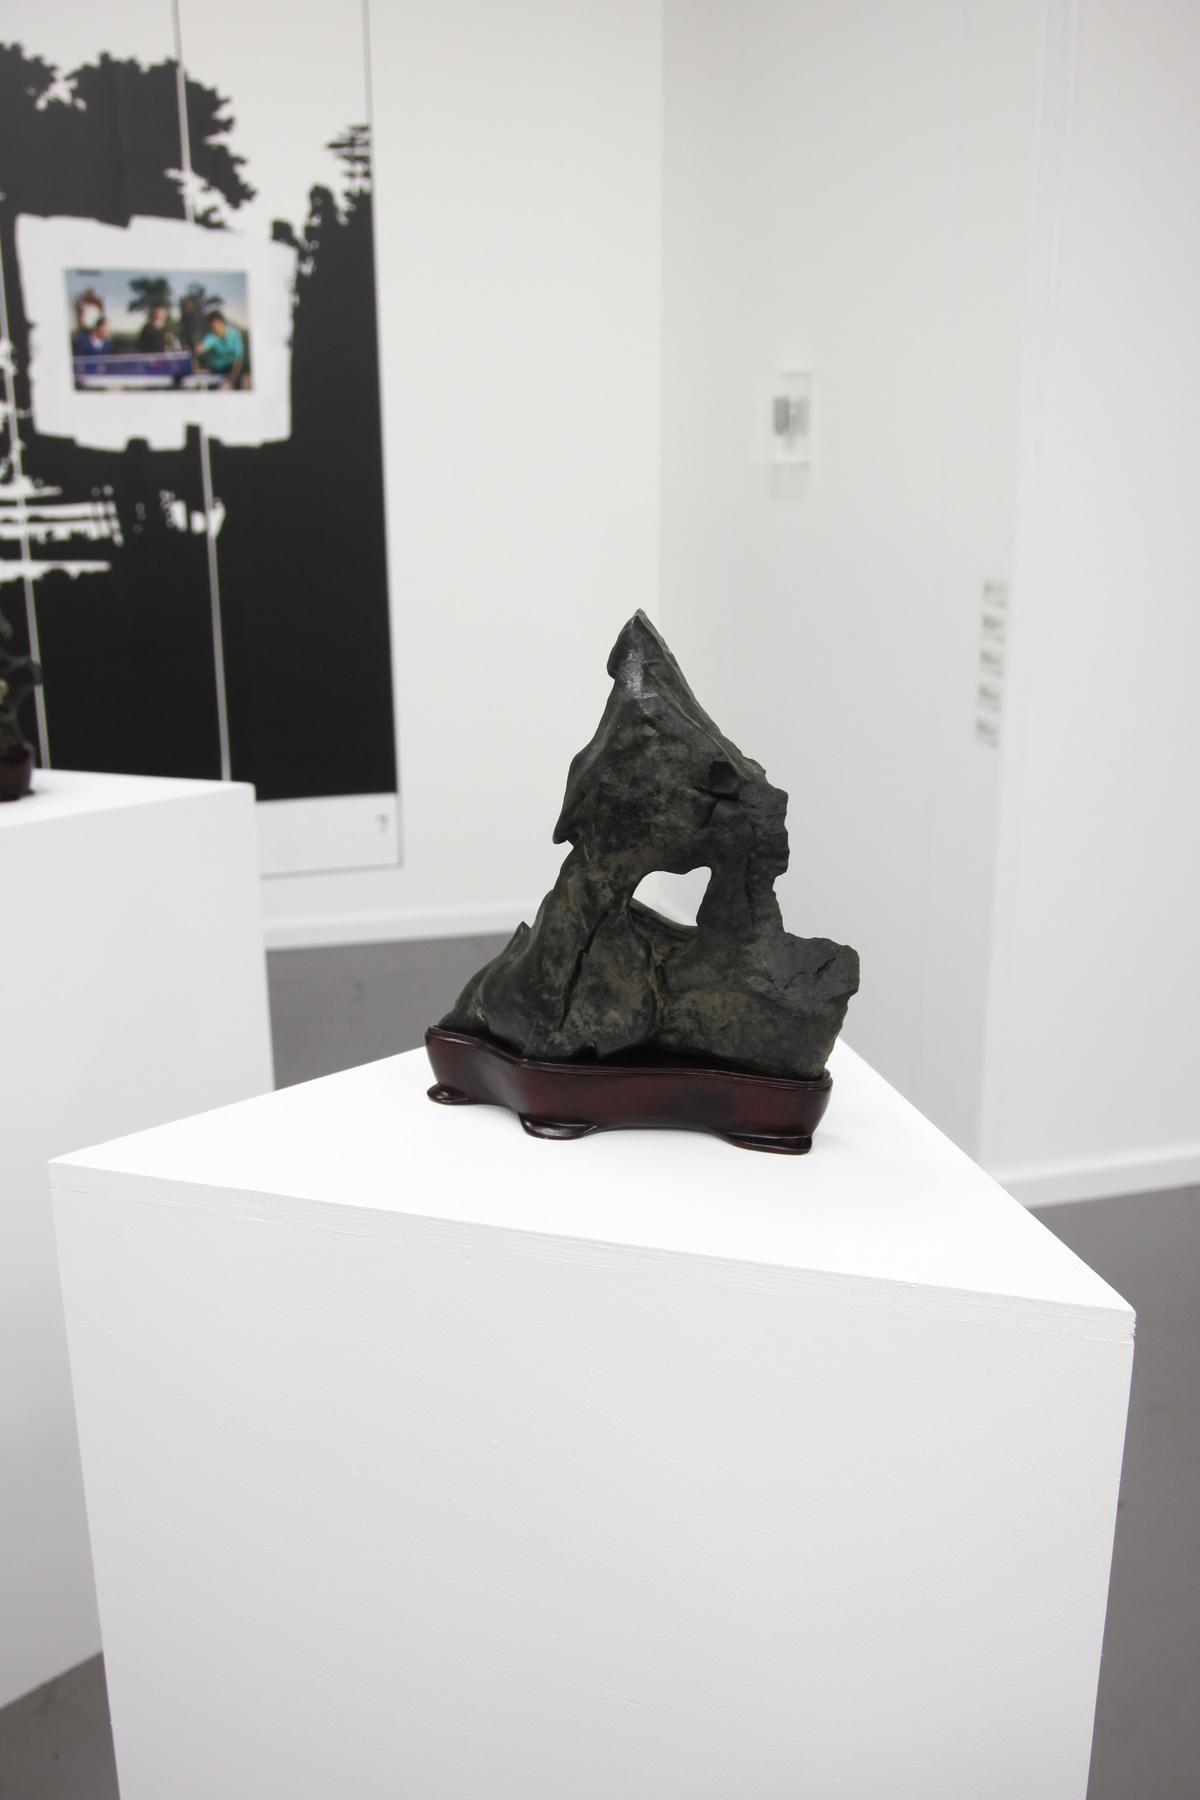 Christian Kosmas Mayer at Galerie Mezzanin 02